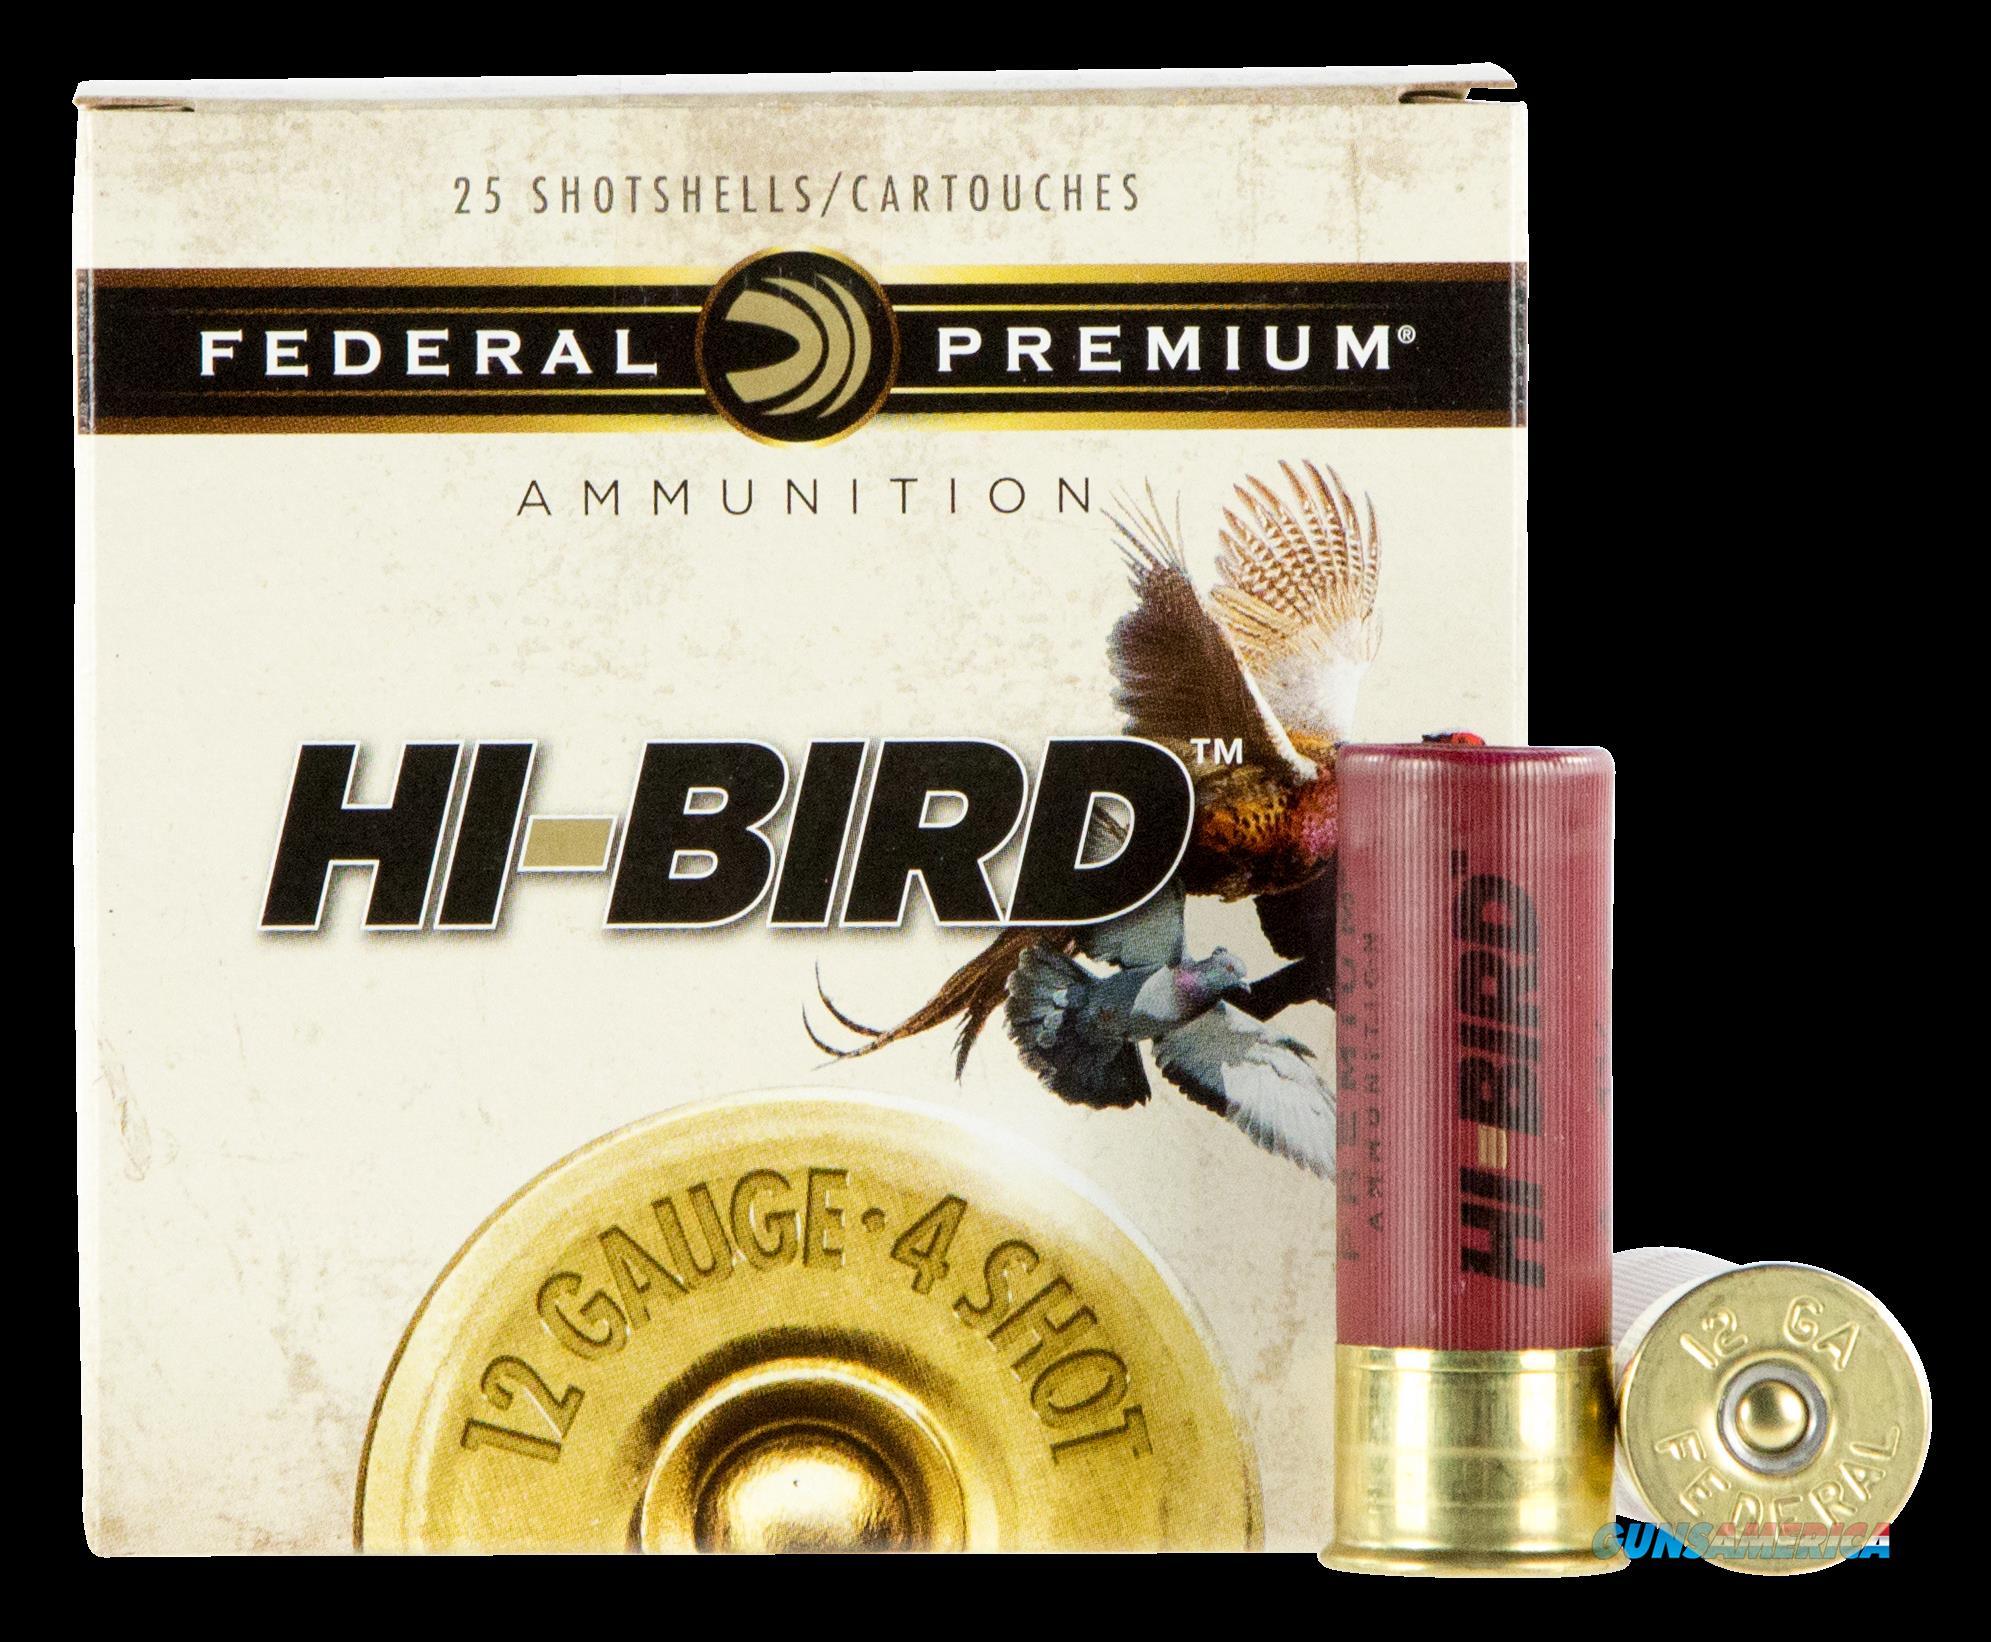 Federal Premium Upland, Fed Hvf12h4   Dove    12    11-4         25-10  Guns > Pistols > 1911 Pistol Copies (non-Colt)